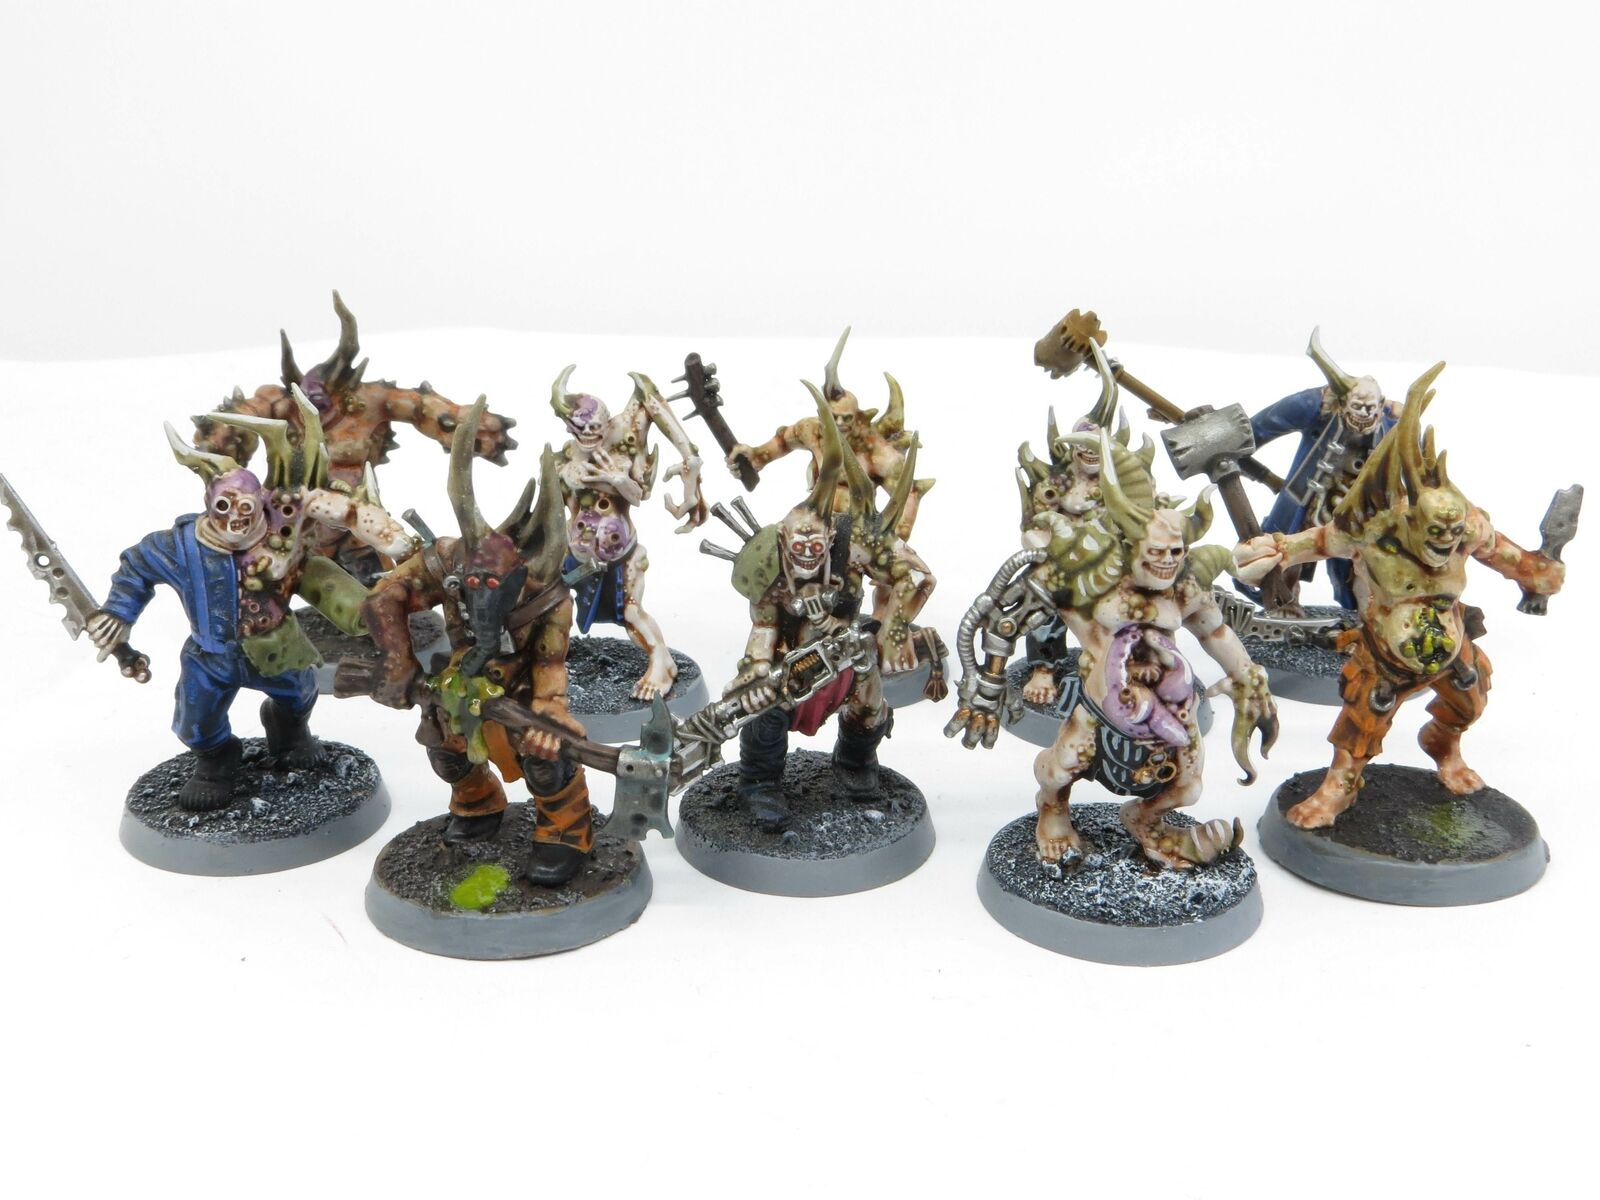 POXWALKERS x 10 Painted Death Guard Nurgle Chaos Marine Warhammer 40k Army Lotz7